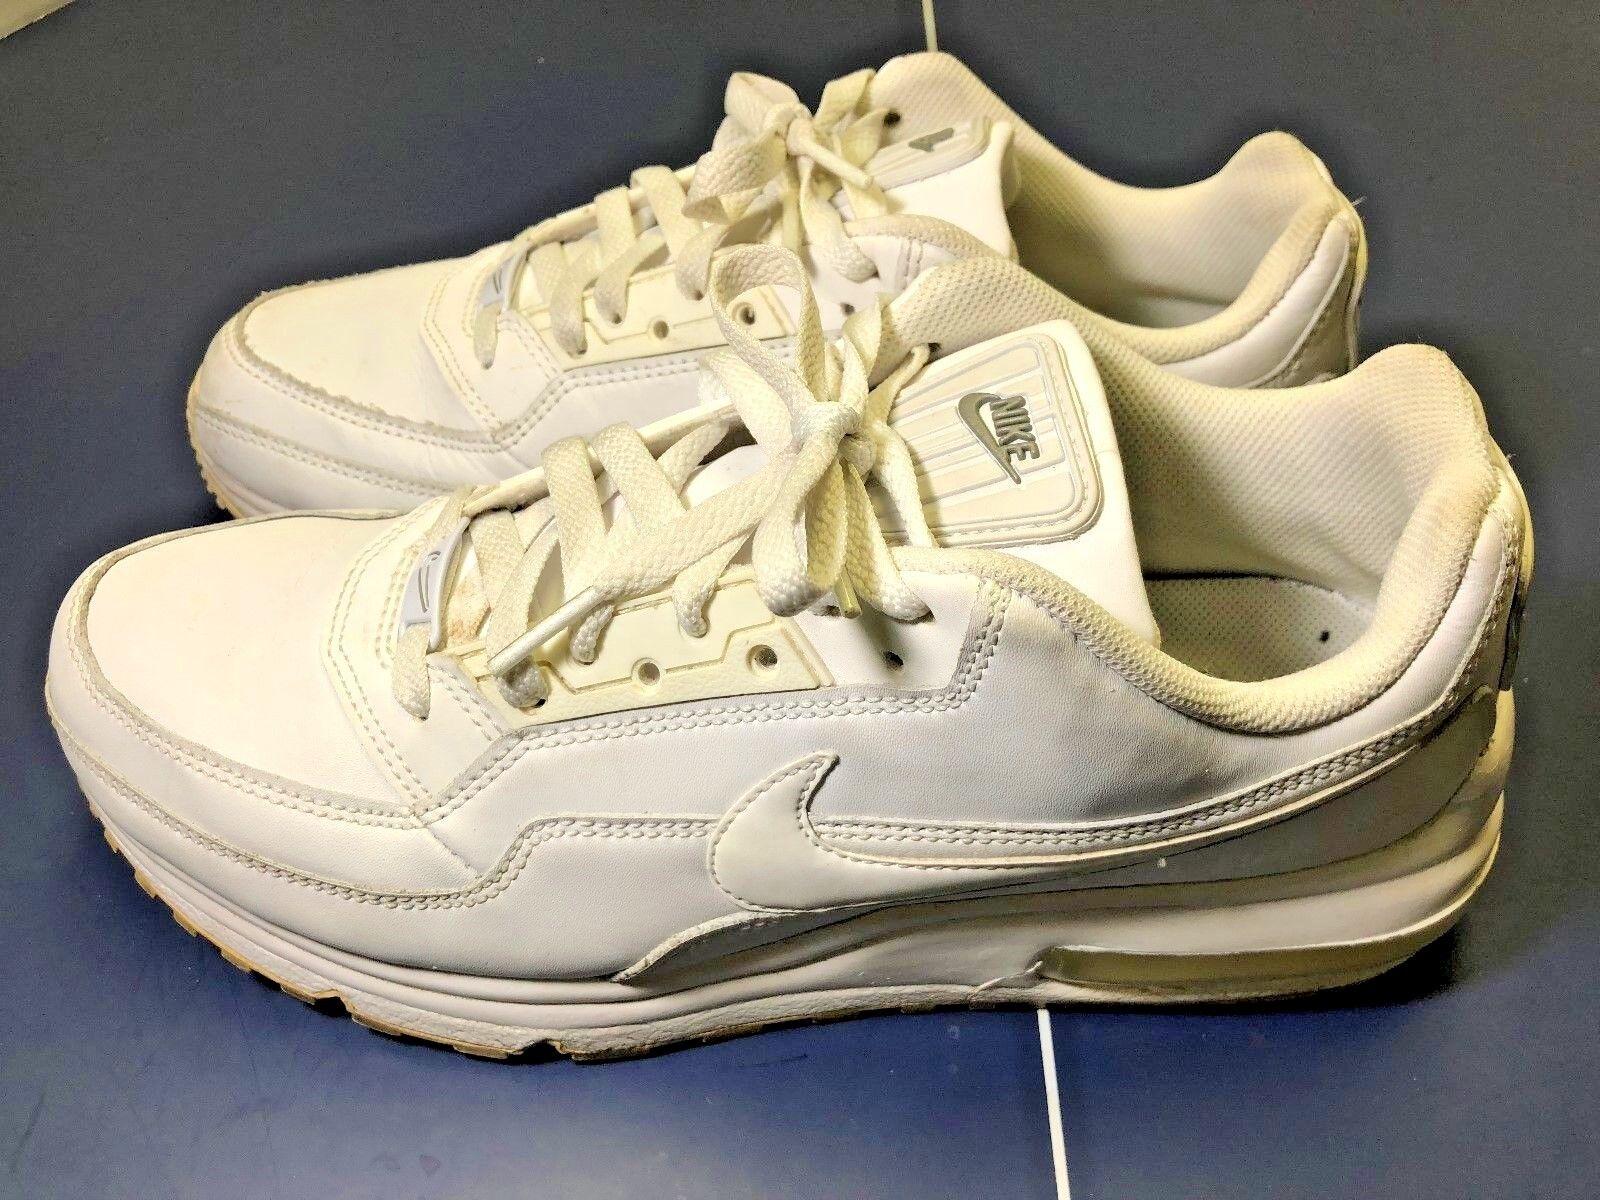 Nike Air Max Ltd Triple Size White Men's Sneakers/Running Shoes, Size Triple 8.8 316376-111 1cbd36